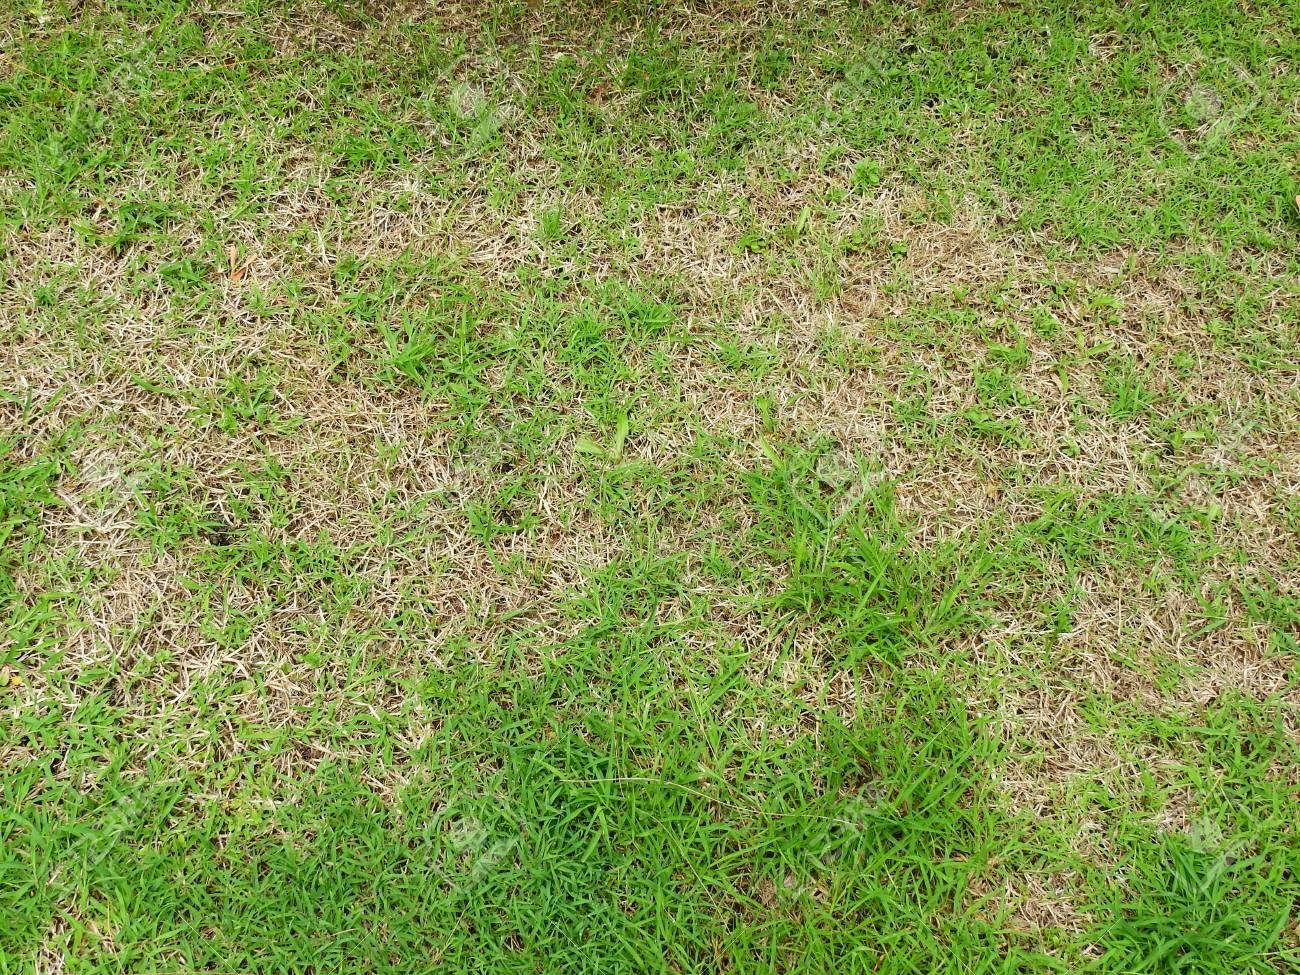 green grass and dry grass texture